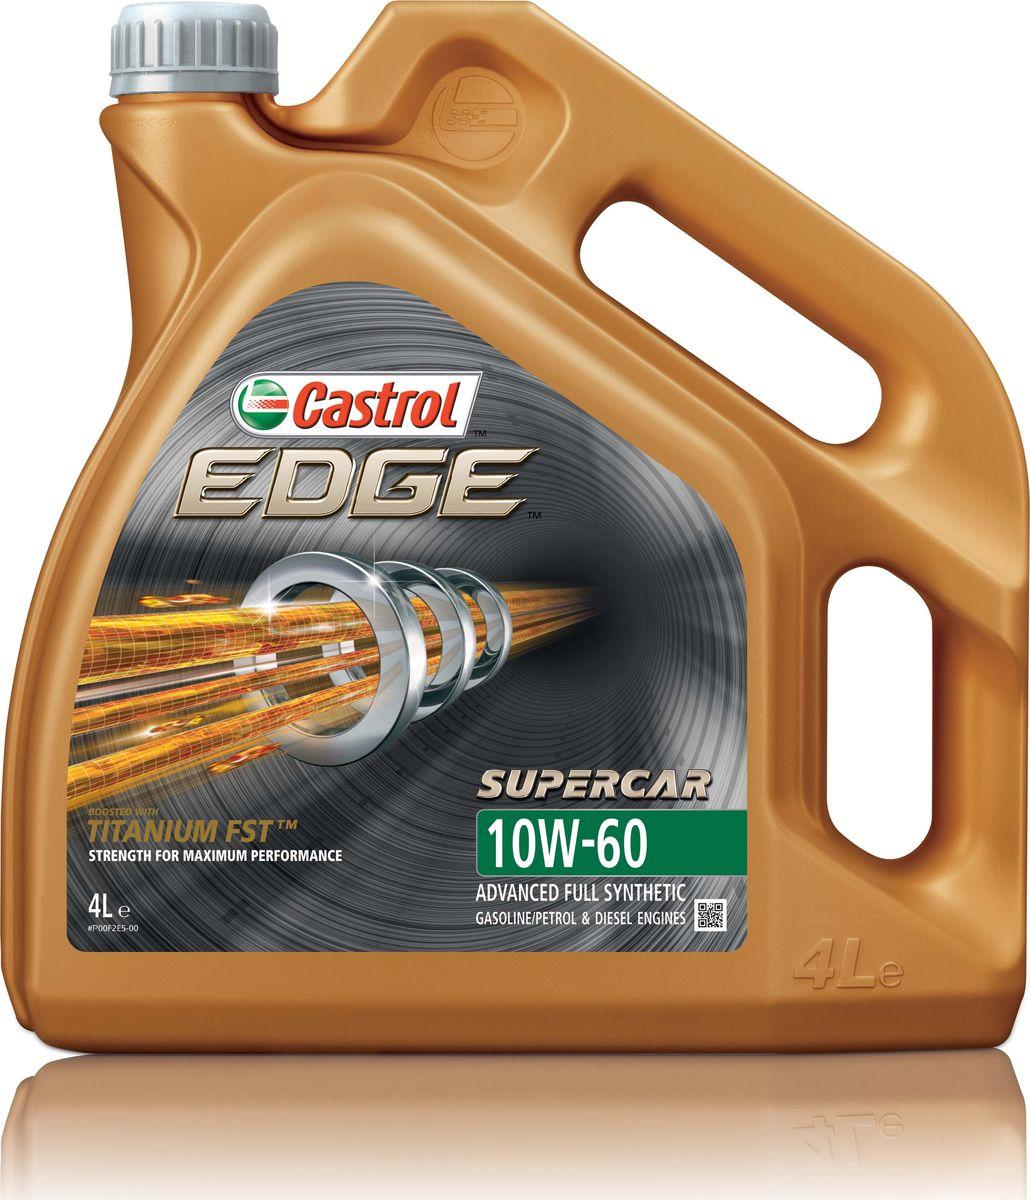 "Масло моторное Castrol ""Edge"", синтетическое, класс вязкости 10W-60, 4 л"